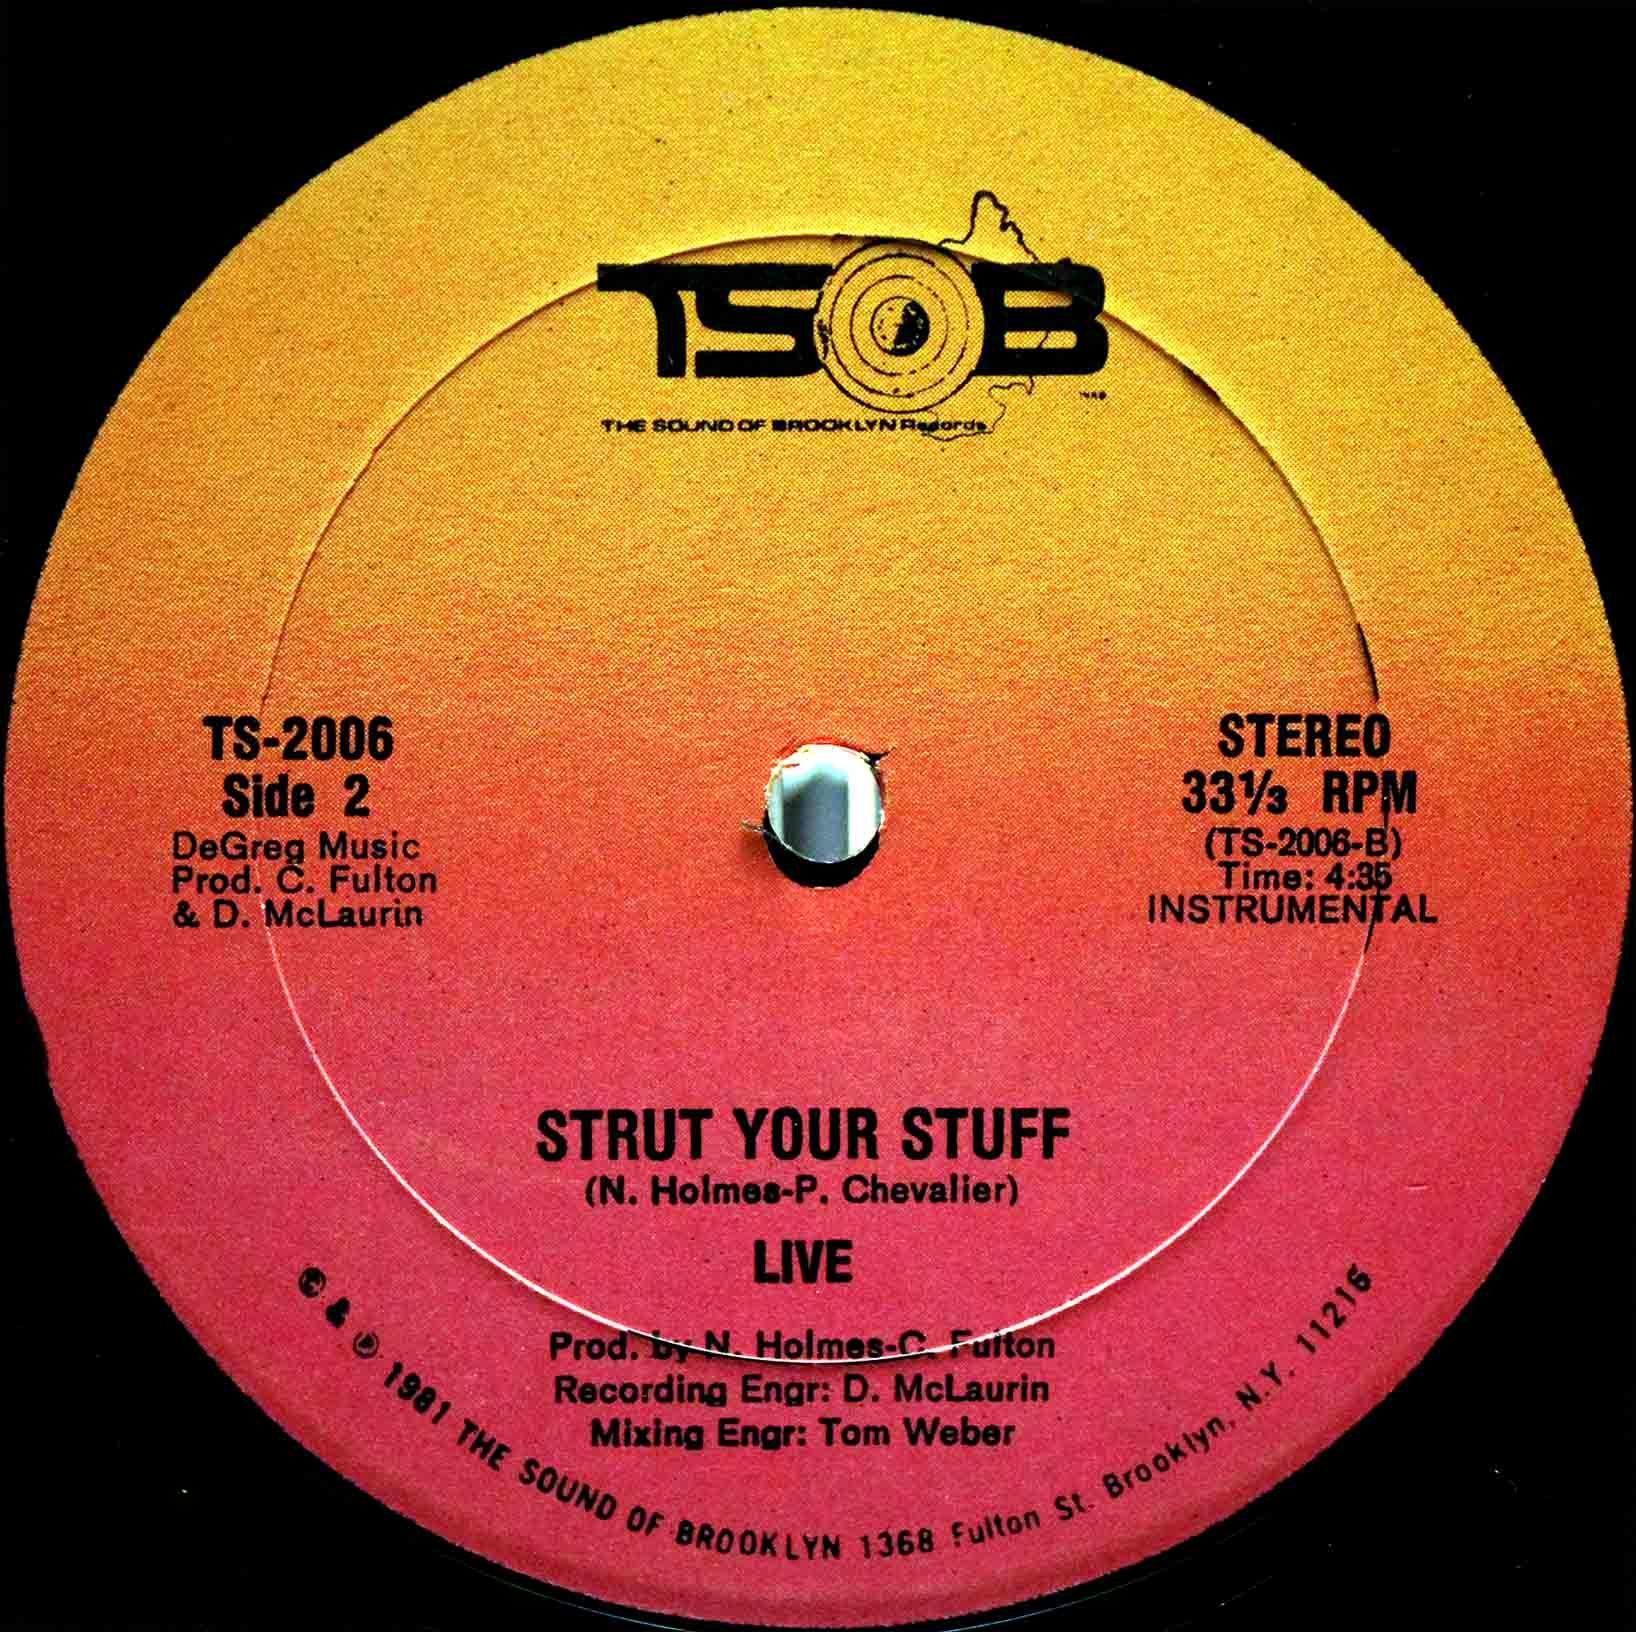 Live – Strut Your Stuff 04